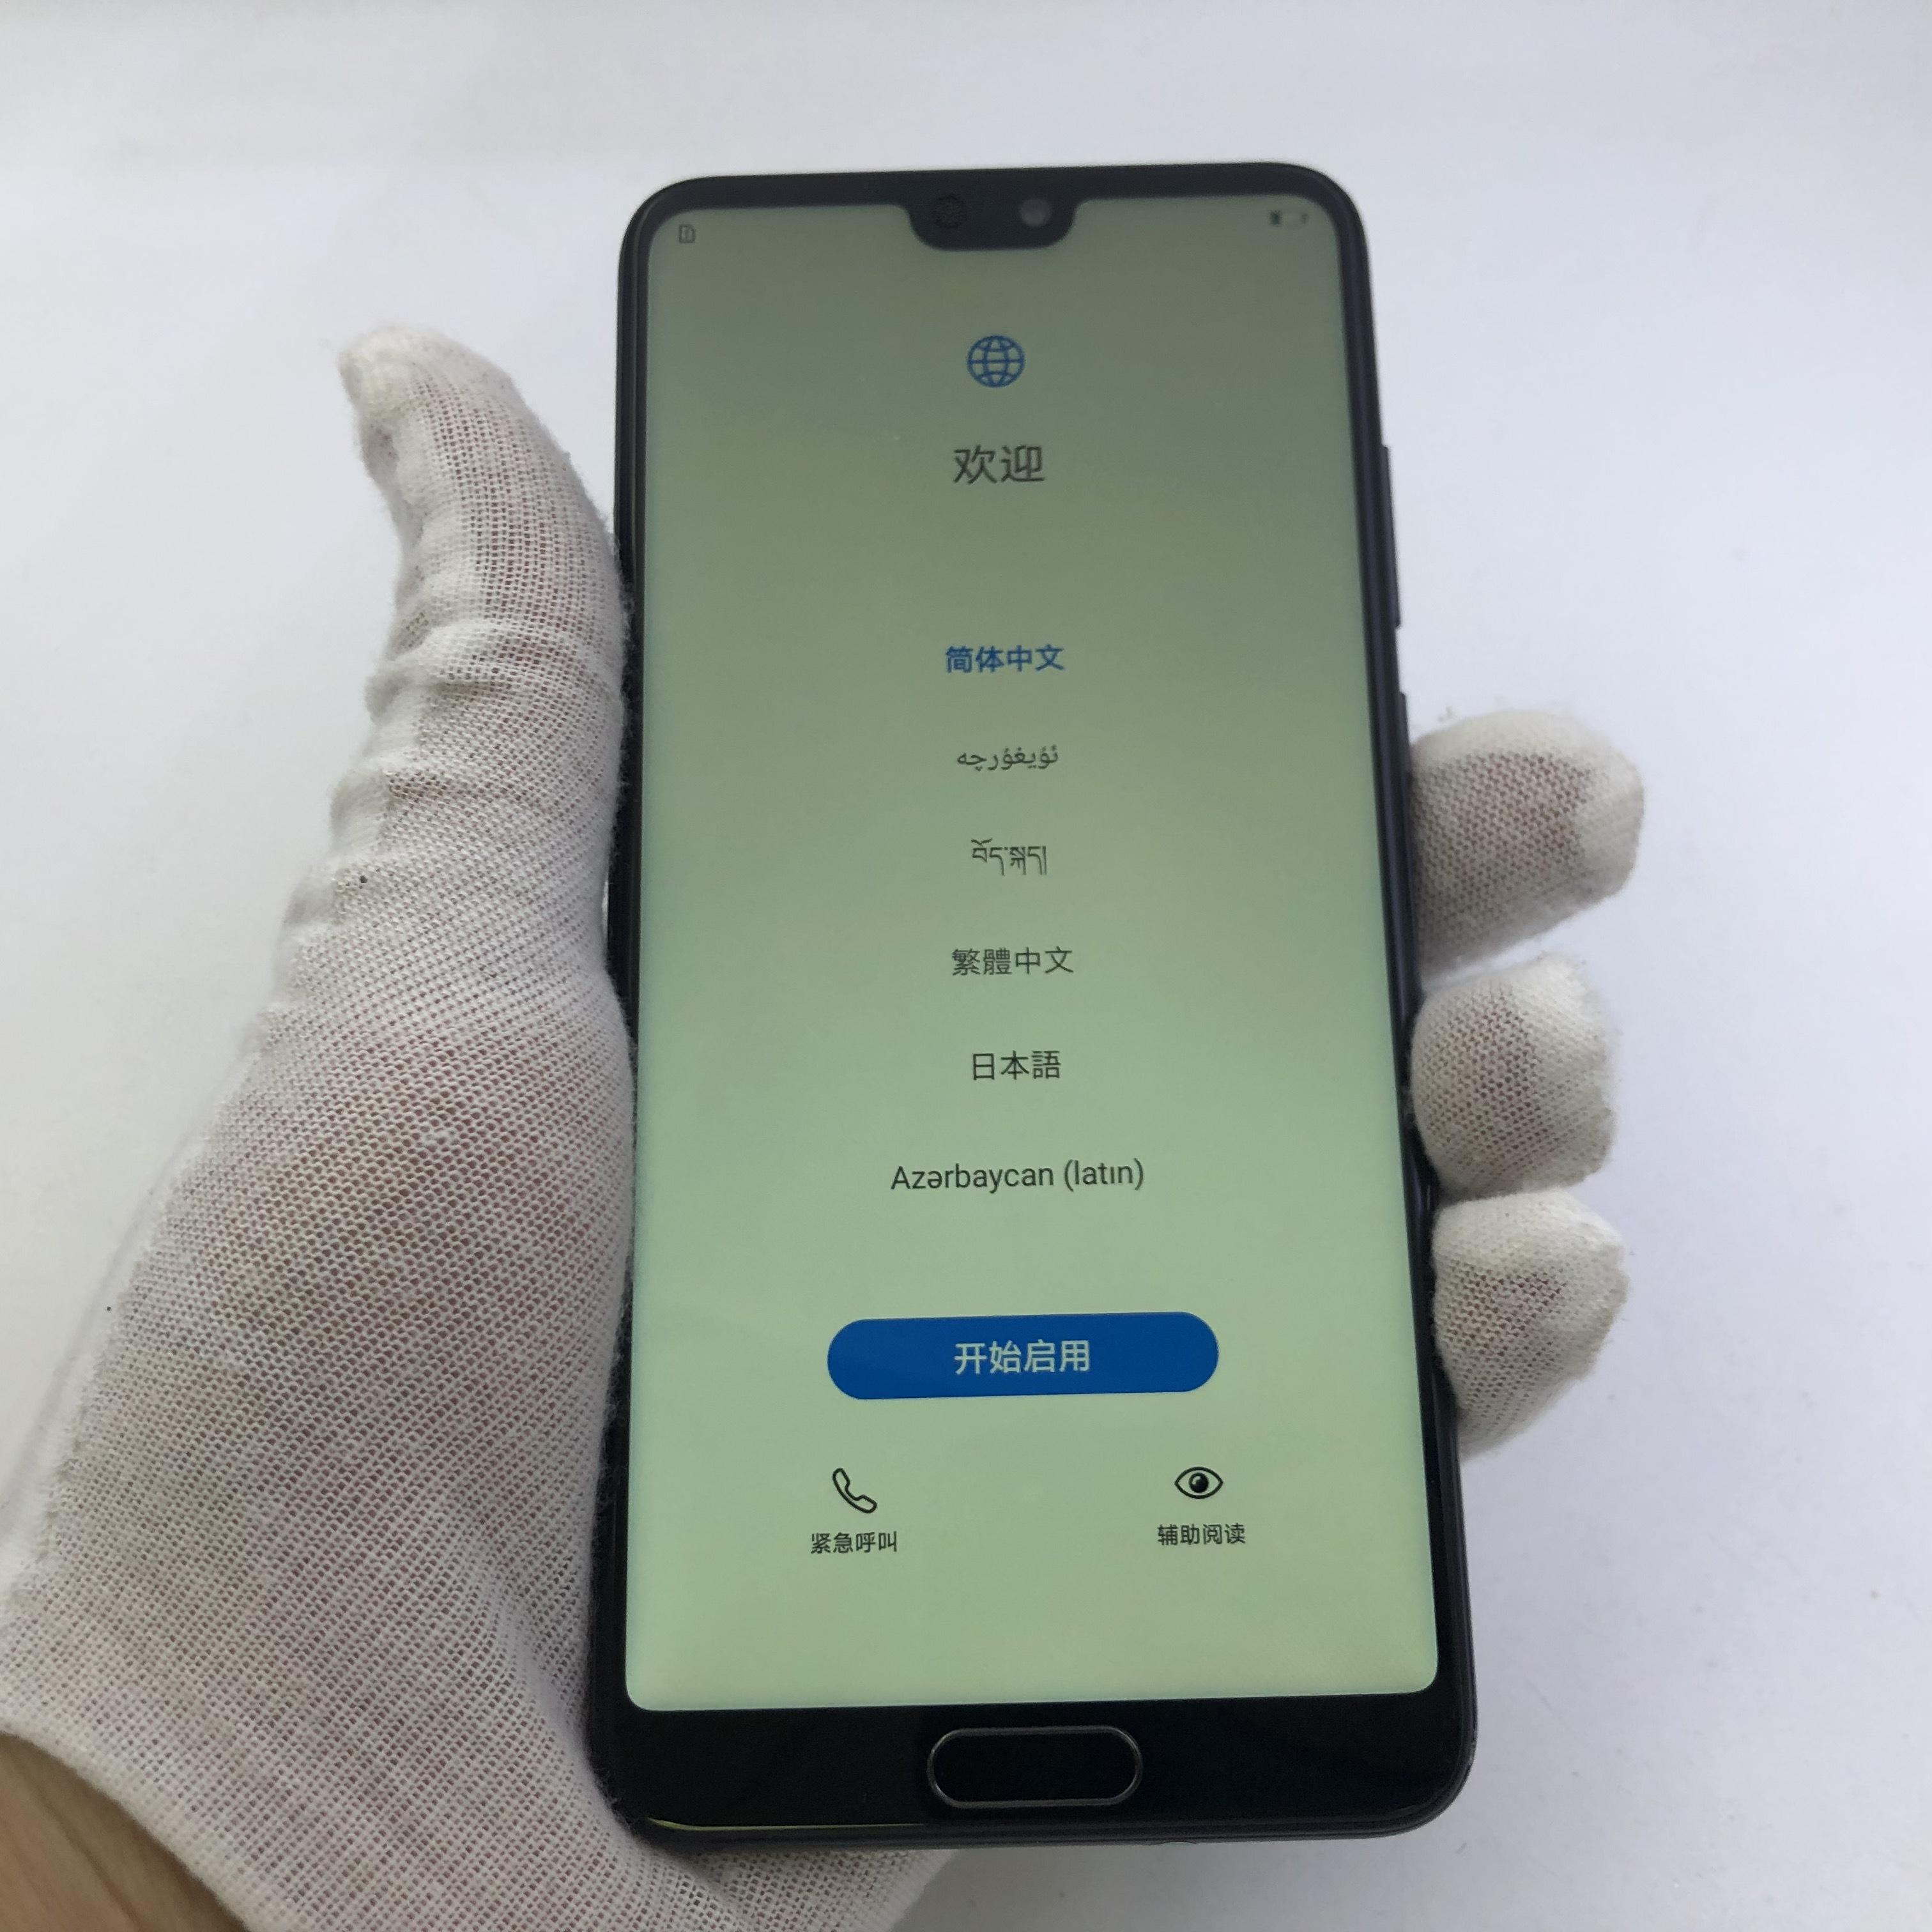 华为【P20】移动 4G/3G/2G 黑色 6G/128G 国行 8成新